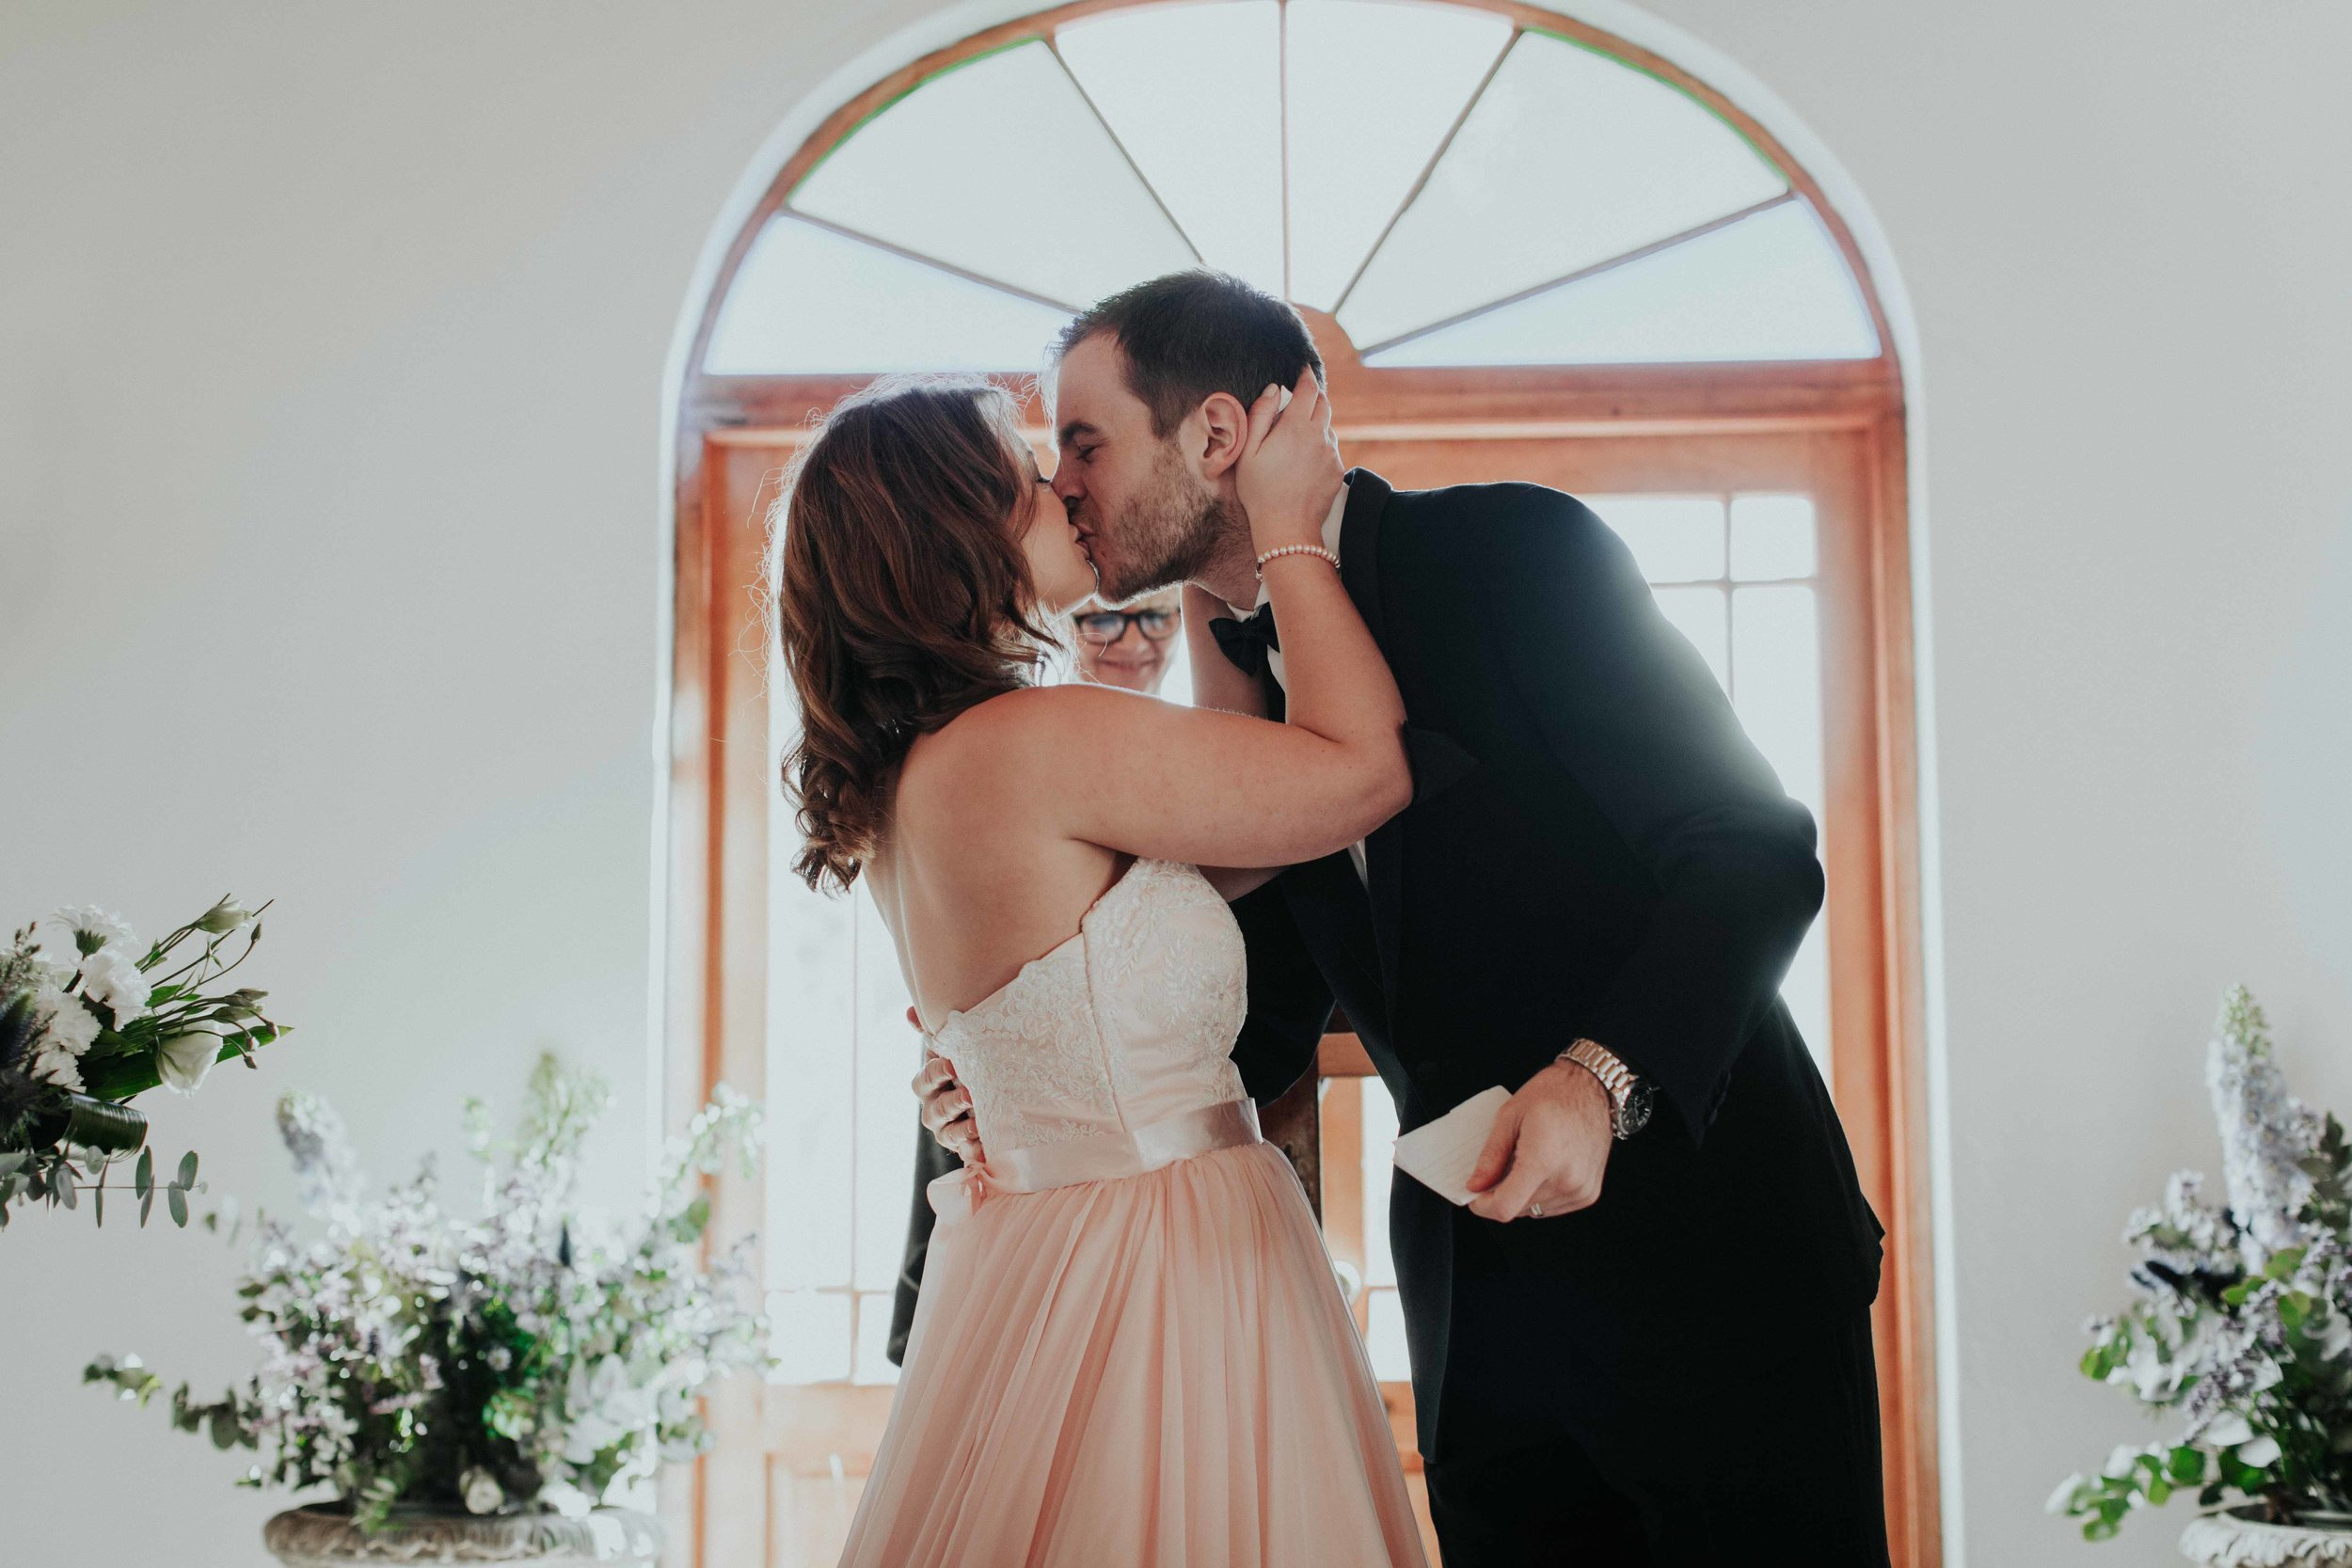 Kristi Smith Photography - Wedding Photography - Darryl & Meg 7.jpg